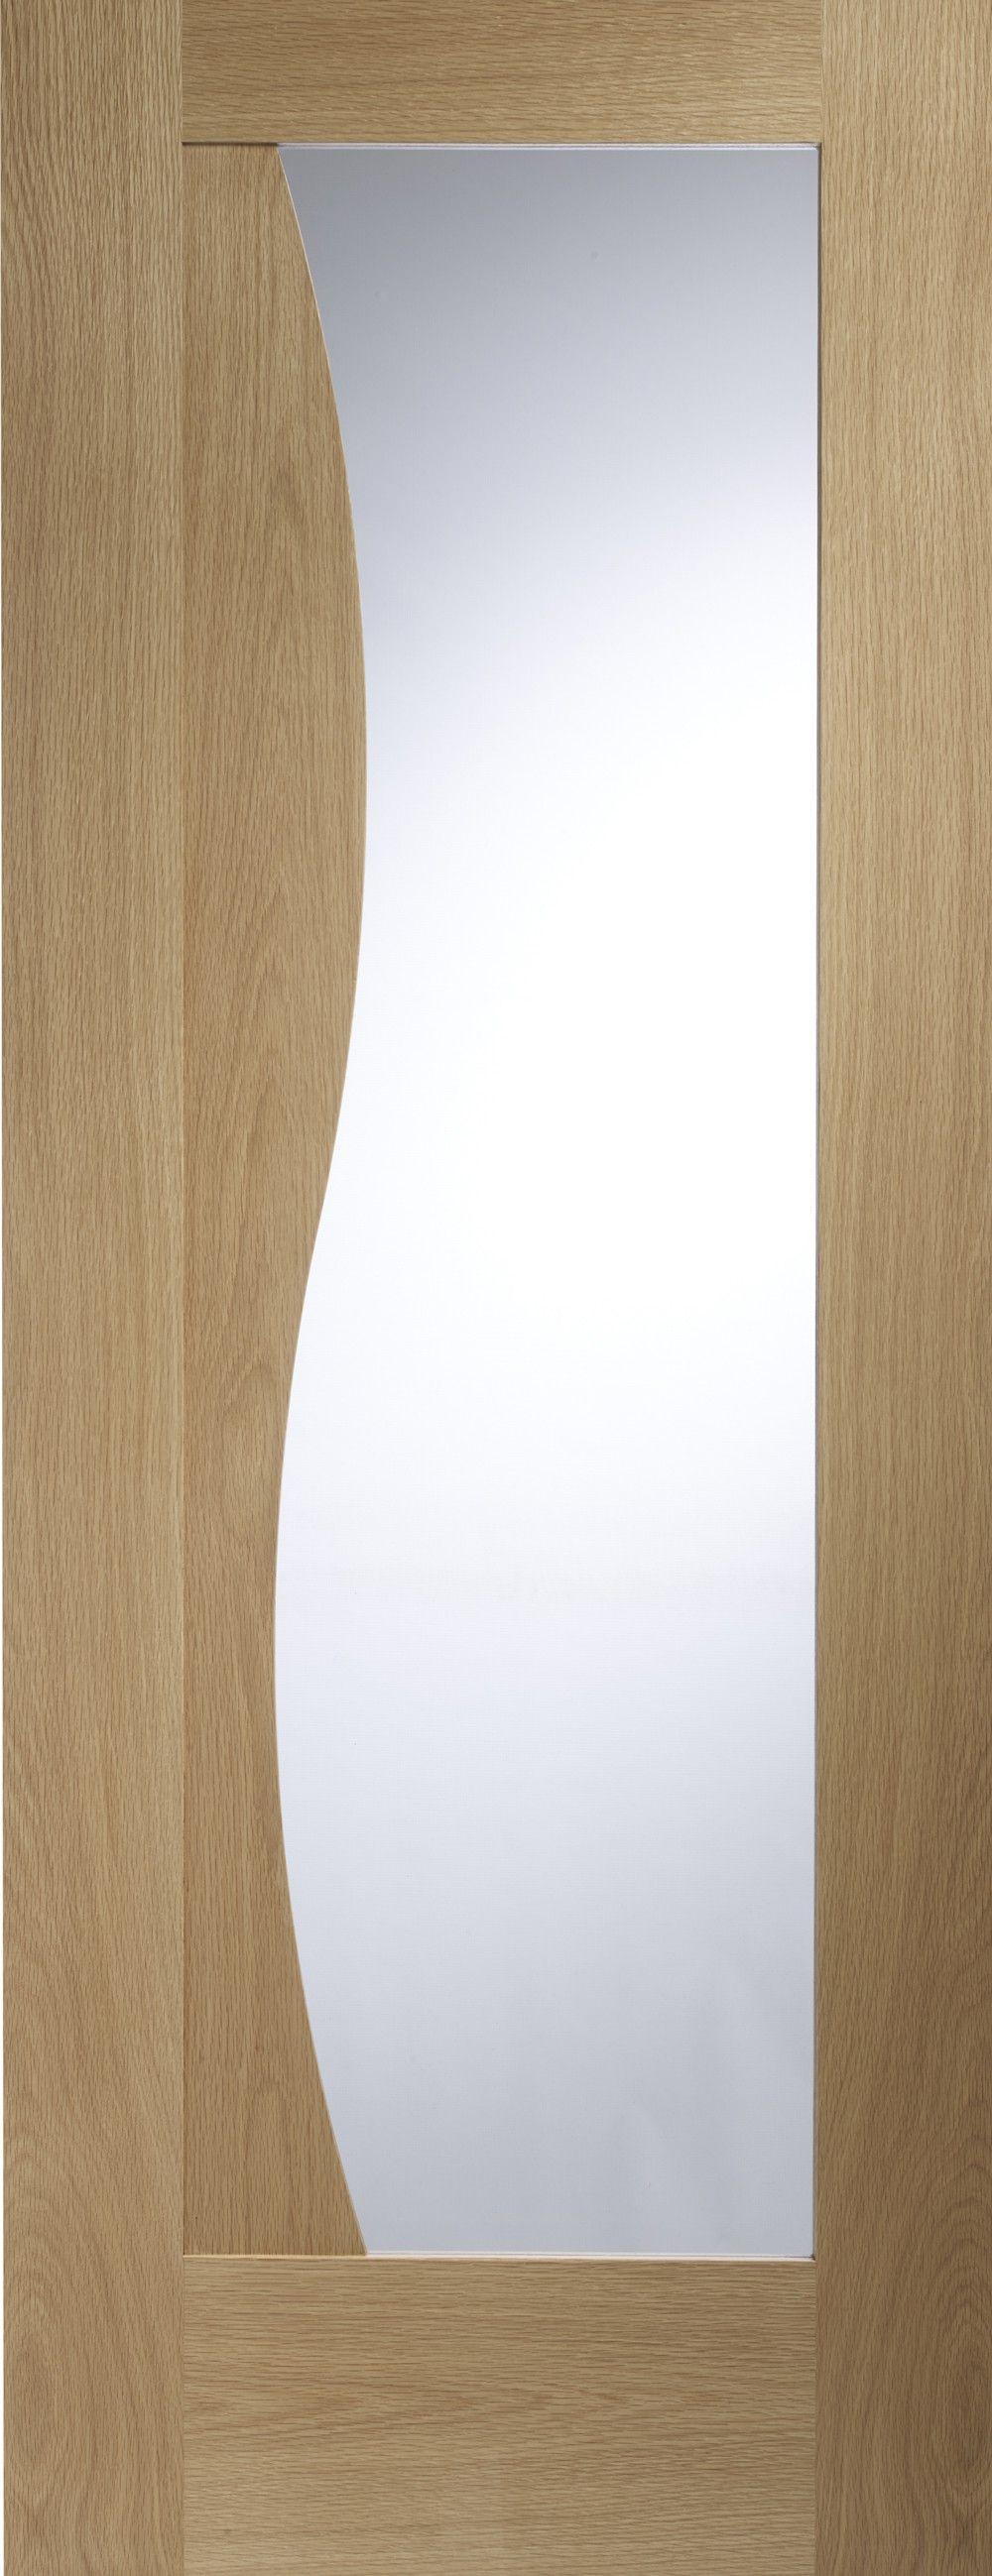 XL - GOEMI30 Emilia Internal Oak Door with Clear Glass & XL - GOEMI30 Emilia Internal Oak Door with Clear Glass | Wonderful ... pezcame.com